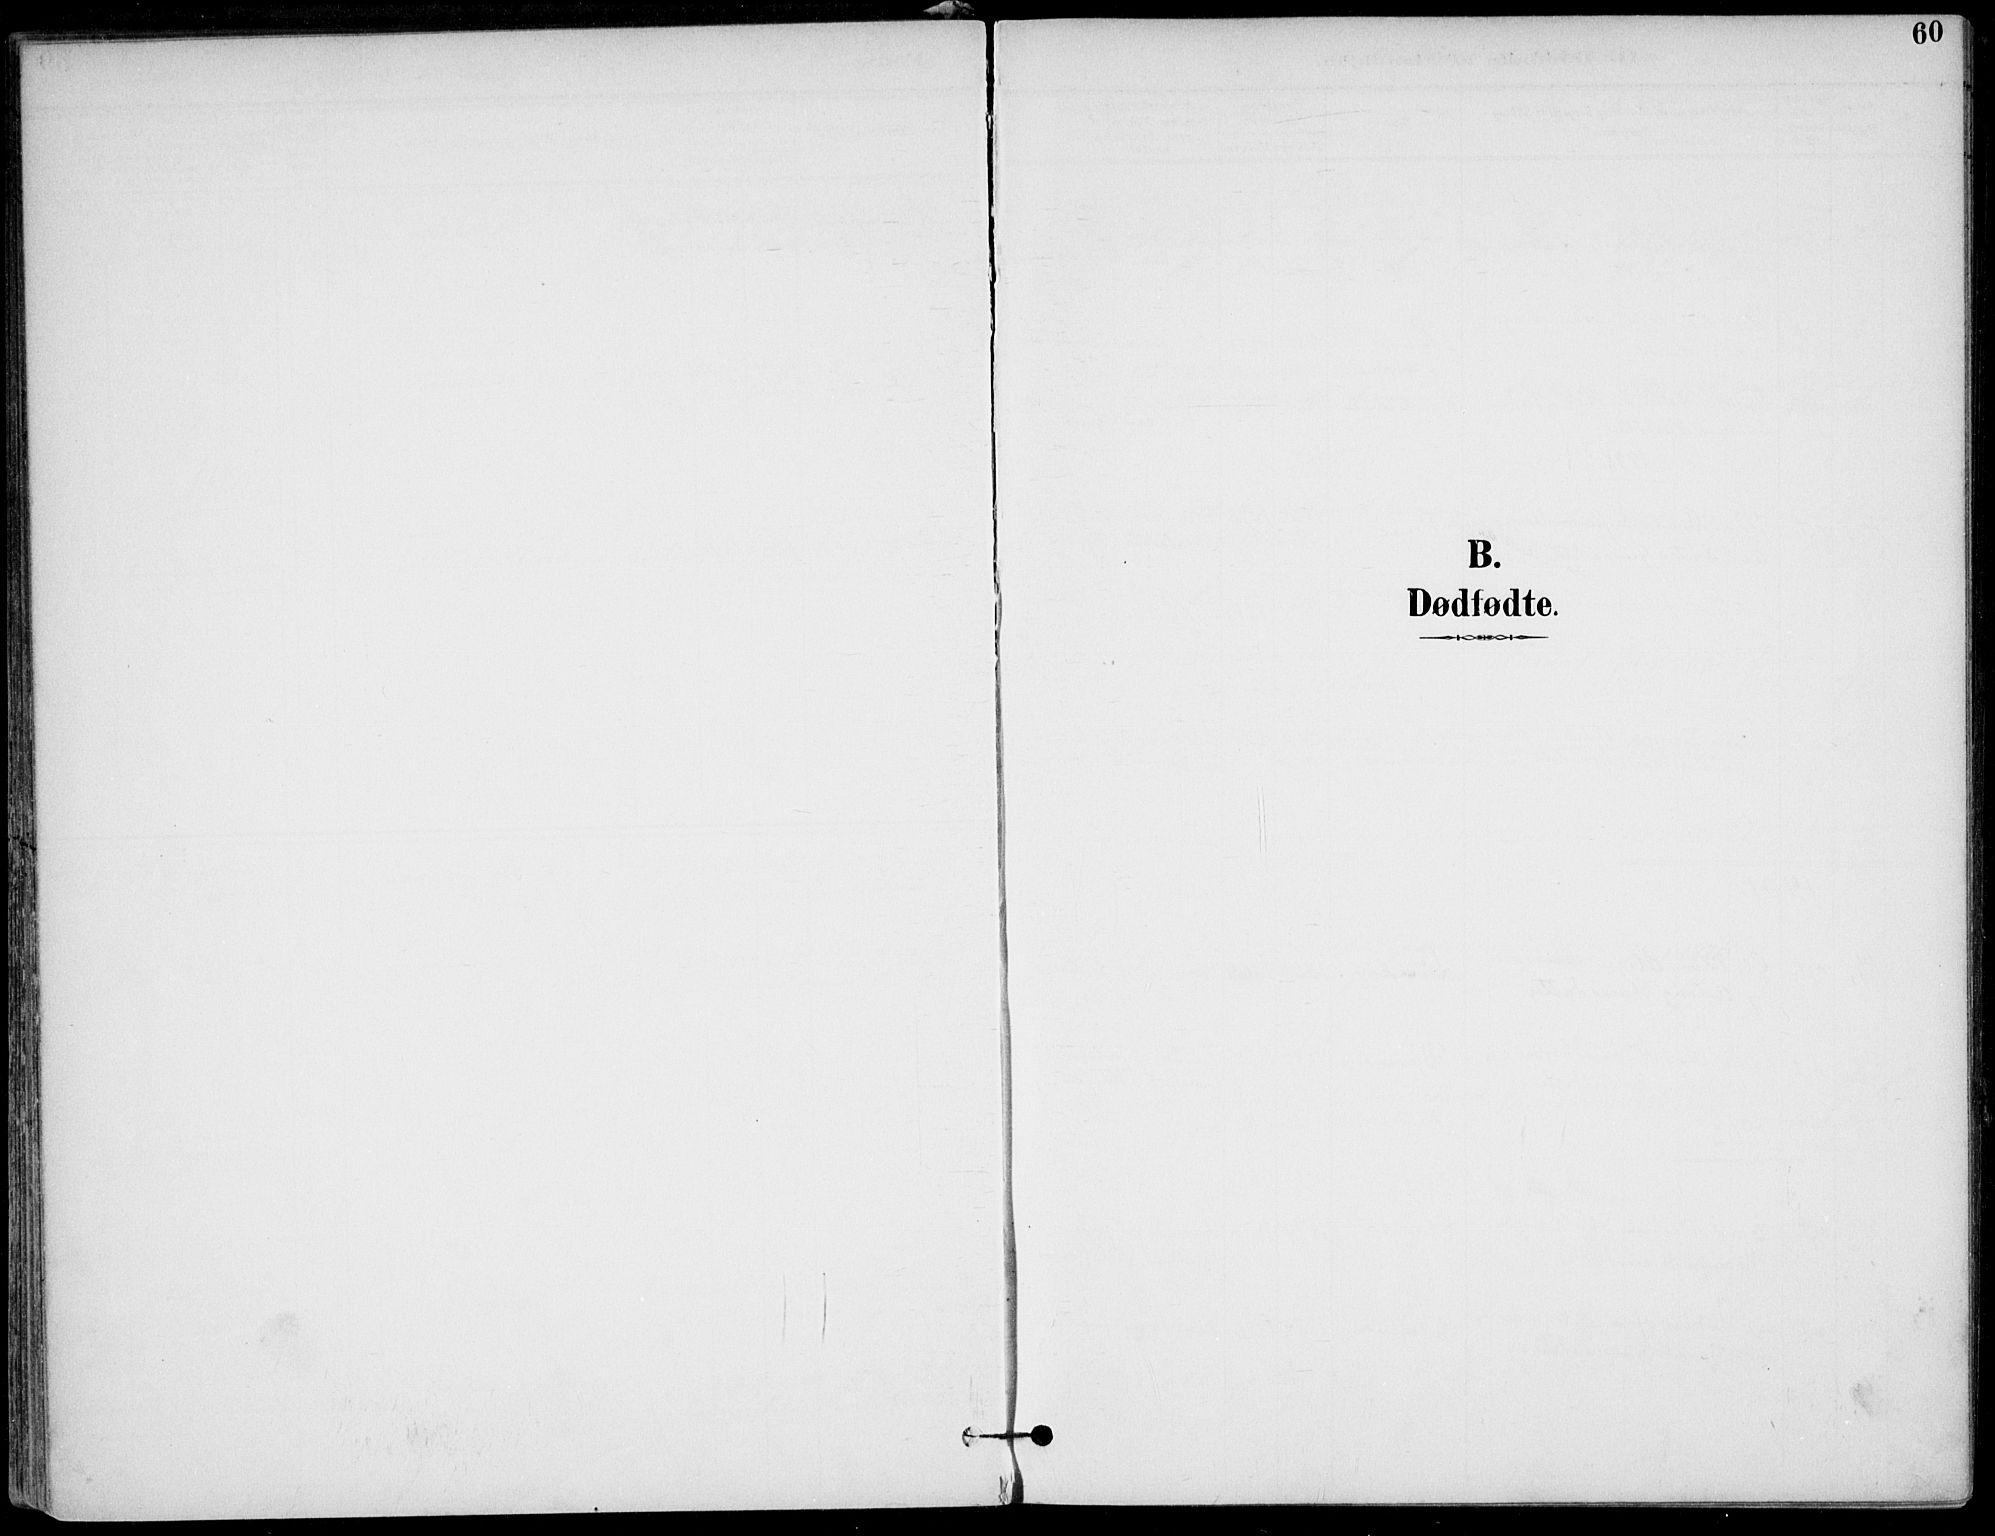 SAKO, Lunde kirkebøker, F/Fa/L0003: Ministerialbok nr. I 3, 1893-1902, s. 60